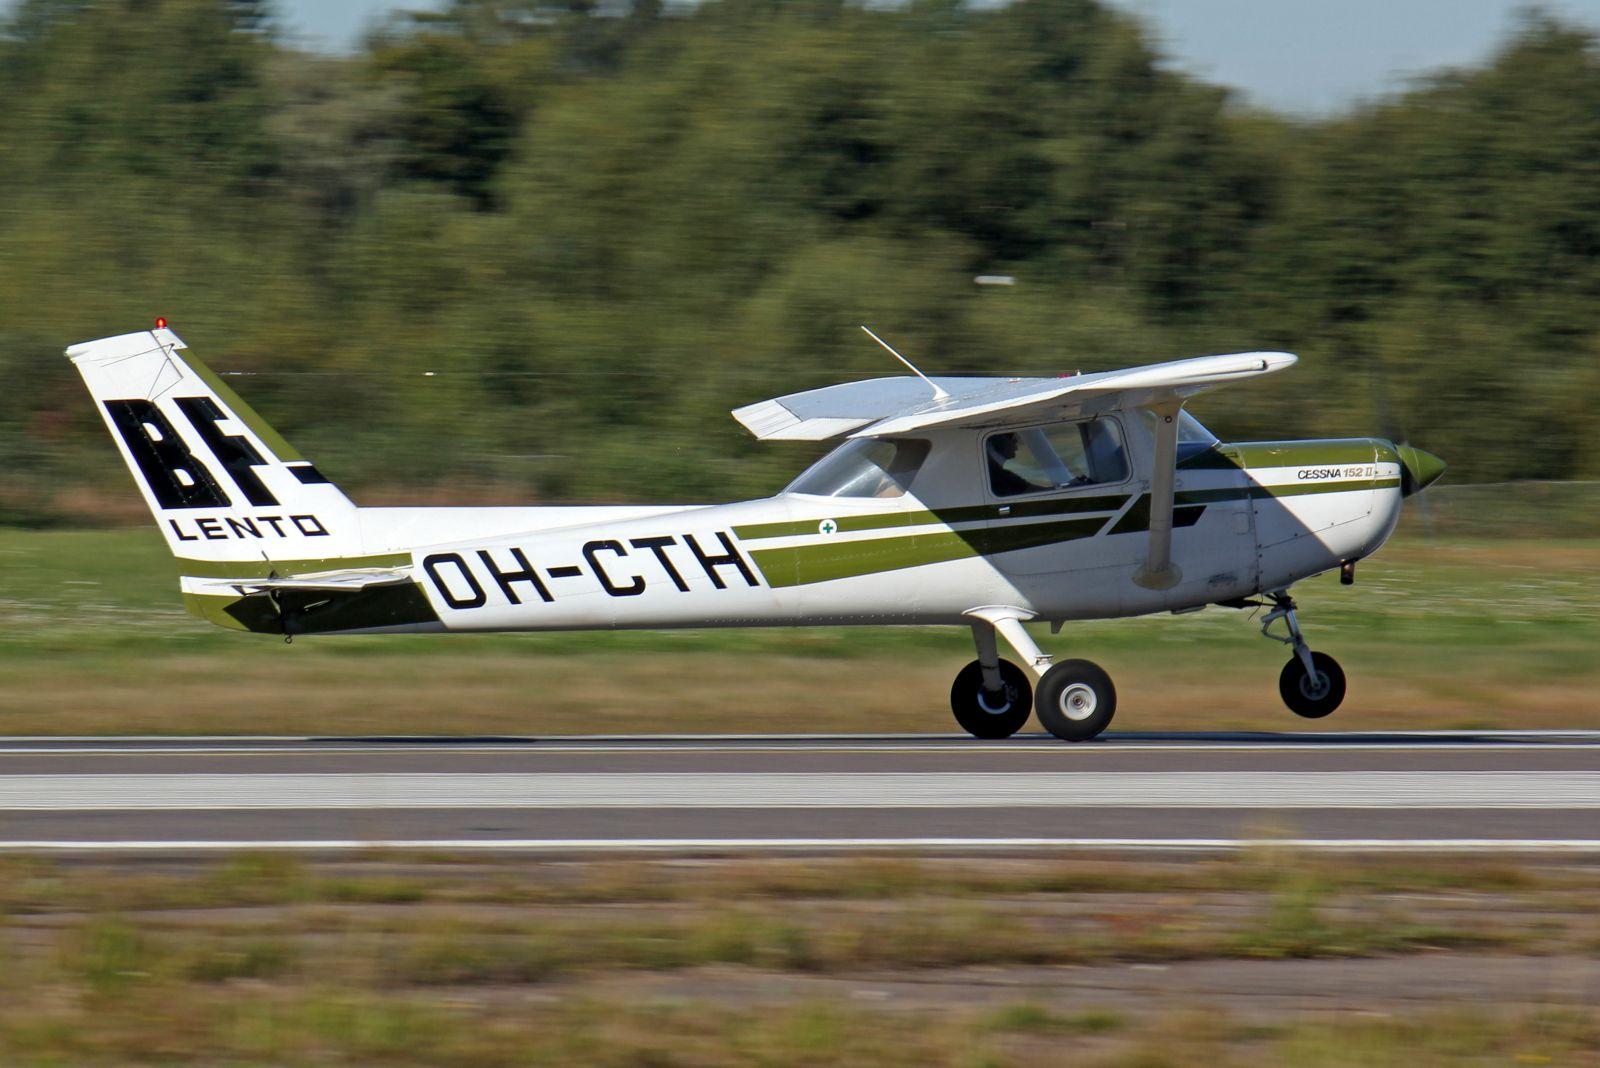 BF-Lento Cessna 152 OH-CTH